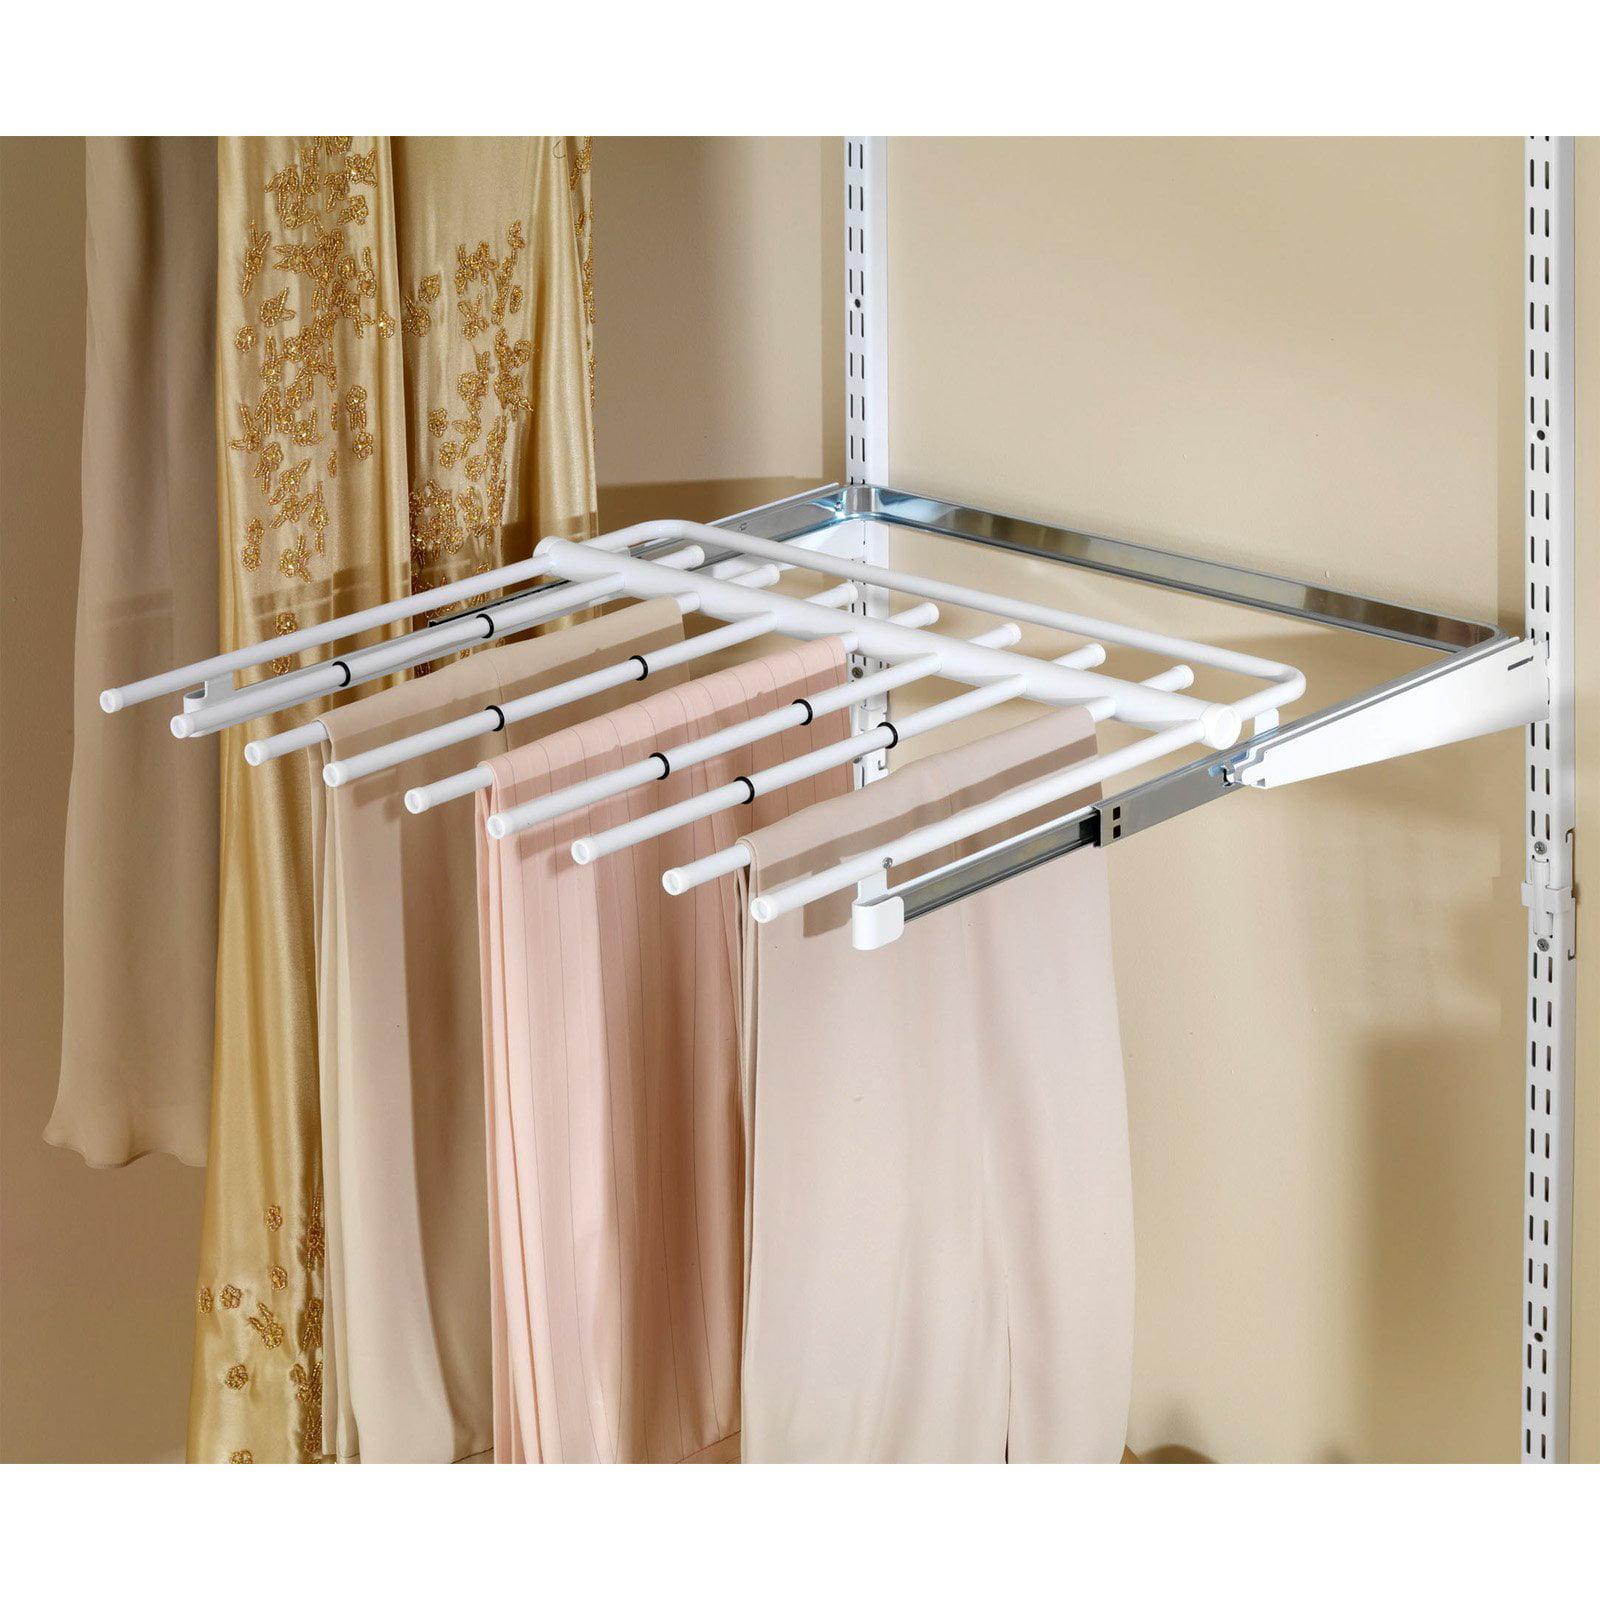 Rubbermaid Configurations Add On Sliding Basket   Titanium   Walmart.com